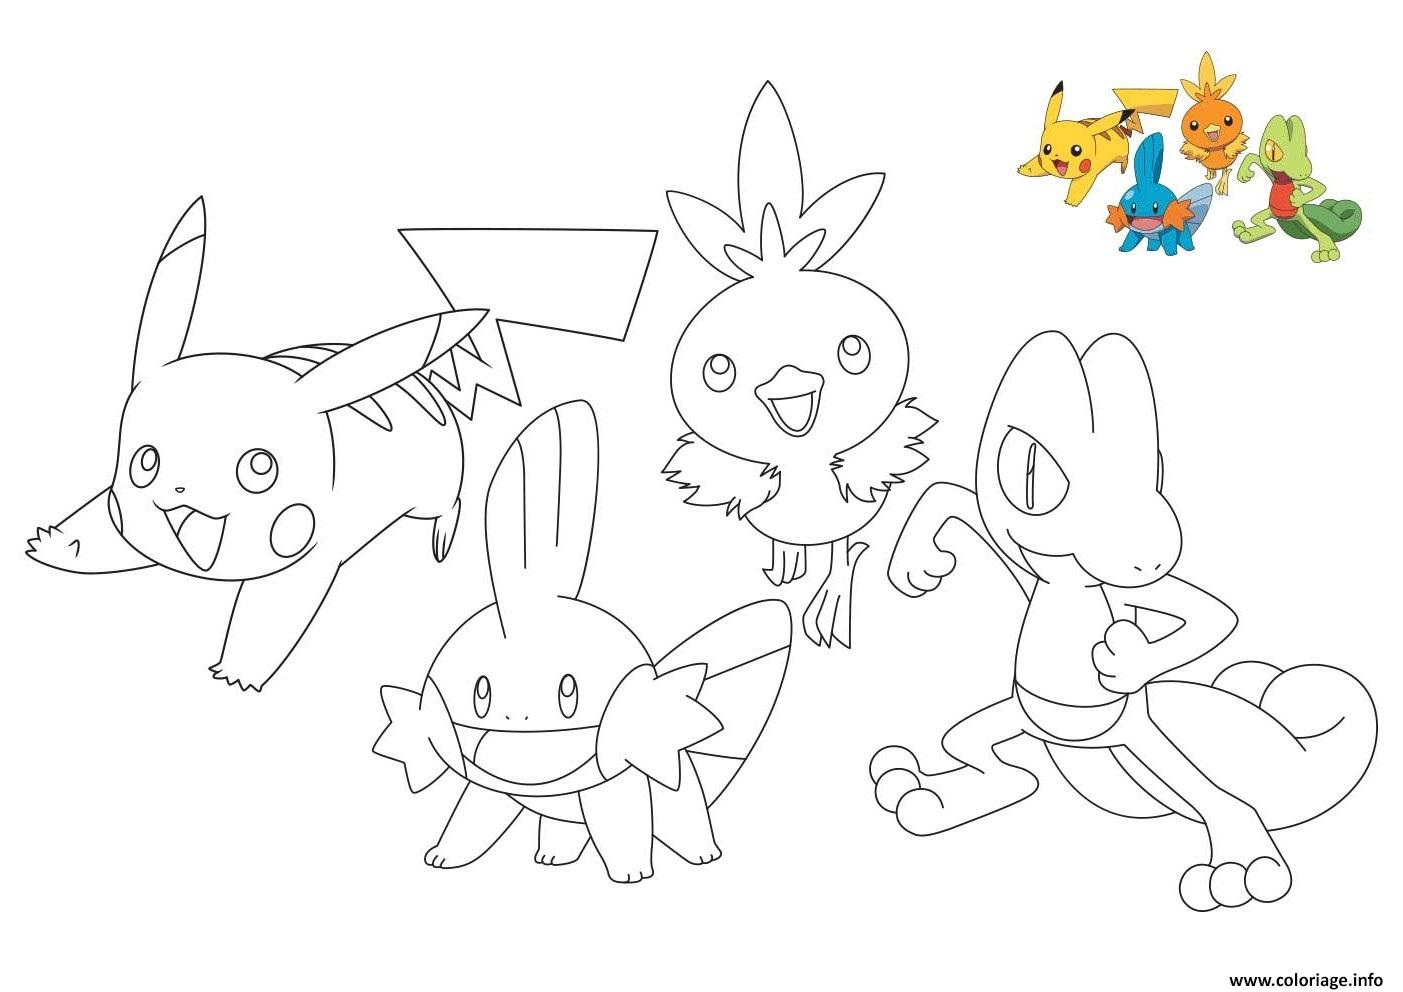 Coloriage Pokemon Pikachu Treecko Torchic Mudkip Jecolorie Com